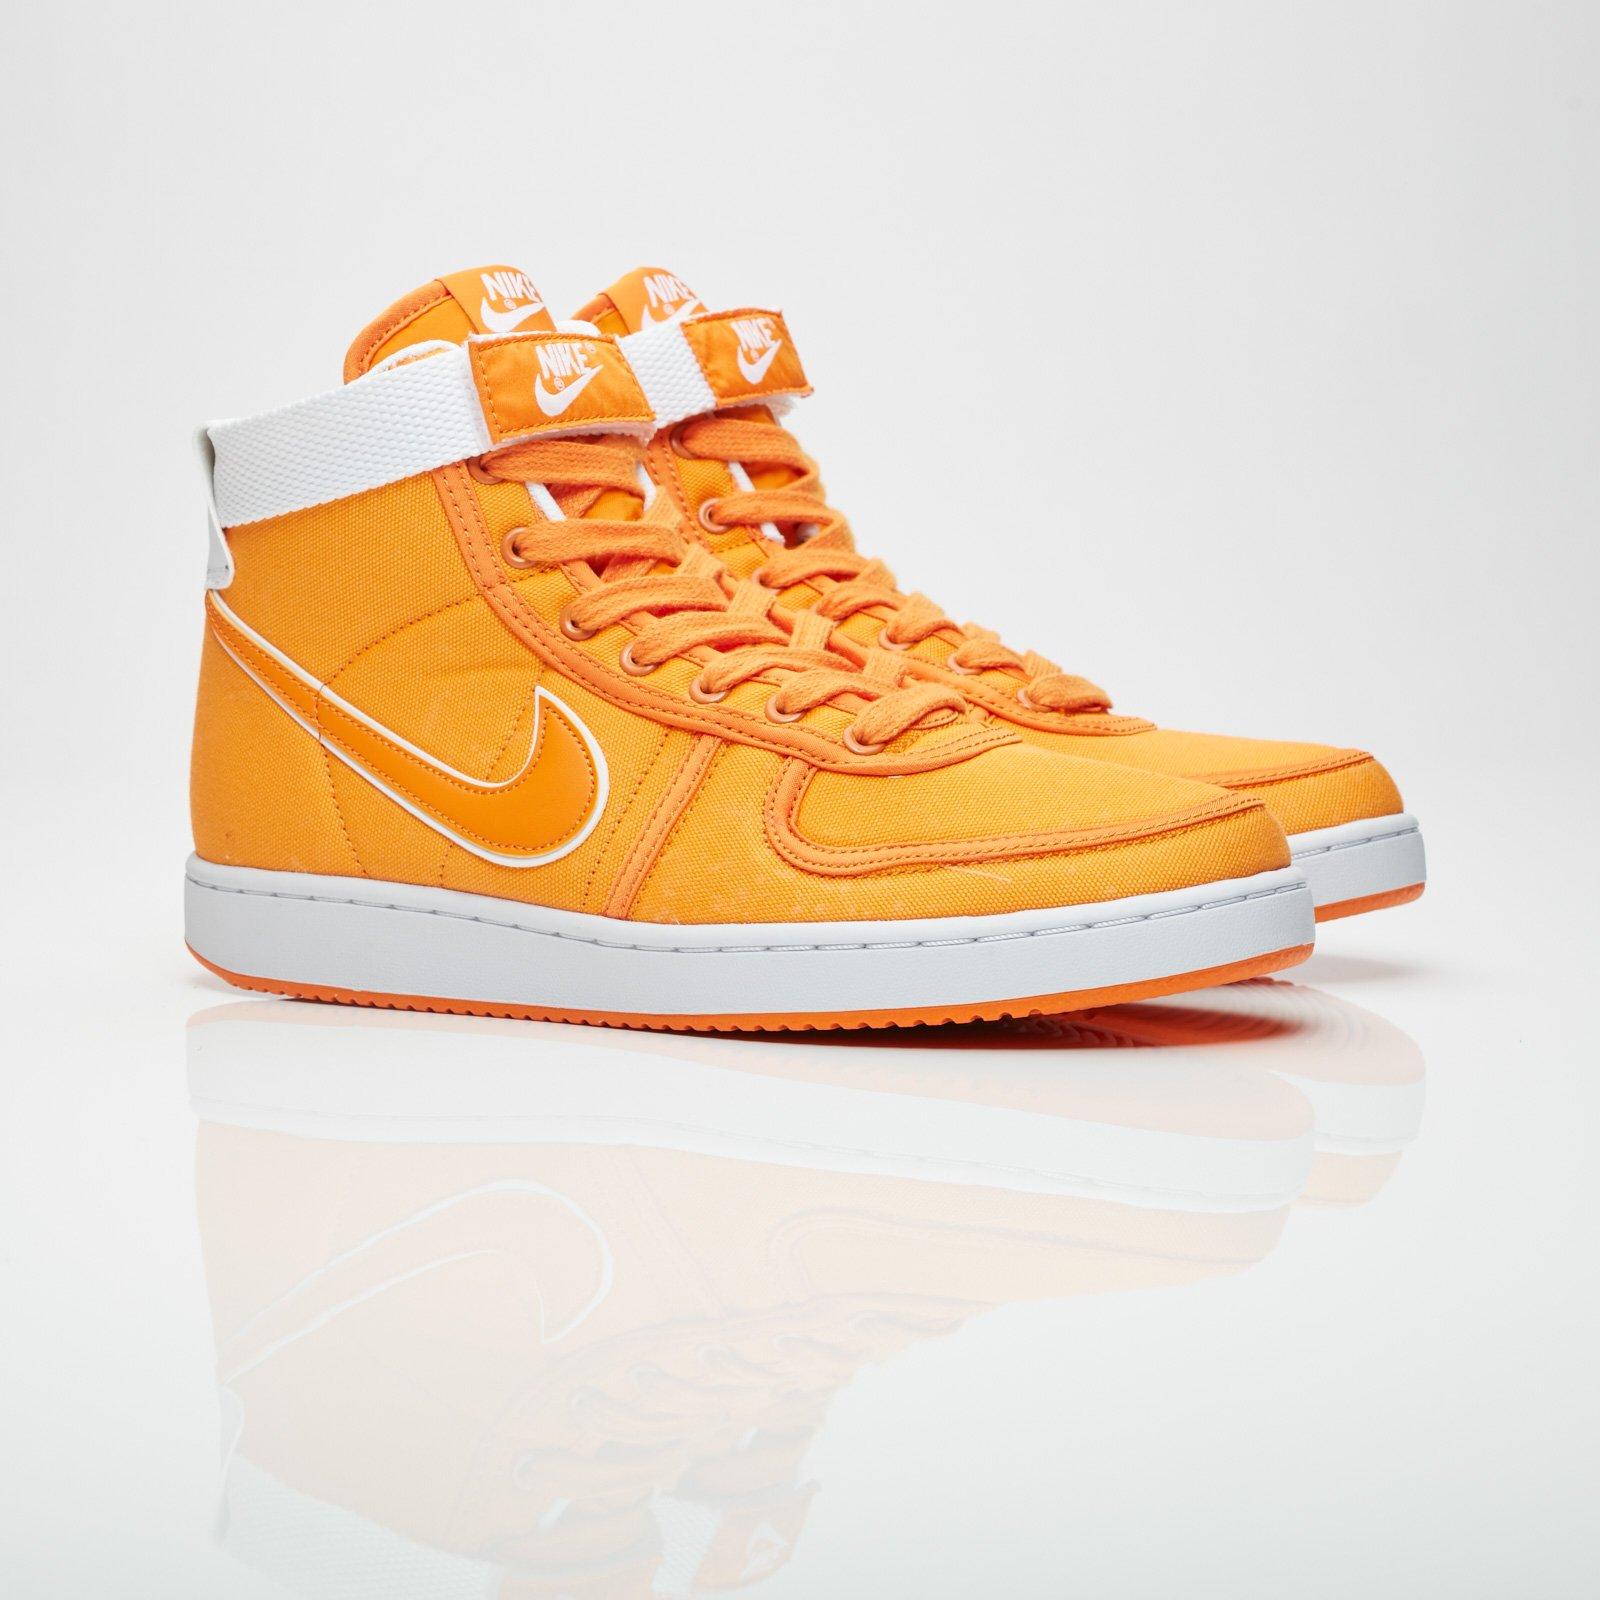 25351f1328fe Nike Vandal High Supreme Canvas QS - Ah8605-800 - Sneakersnstuff ...